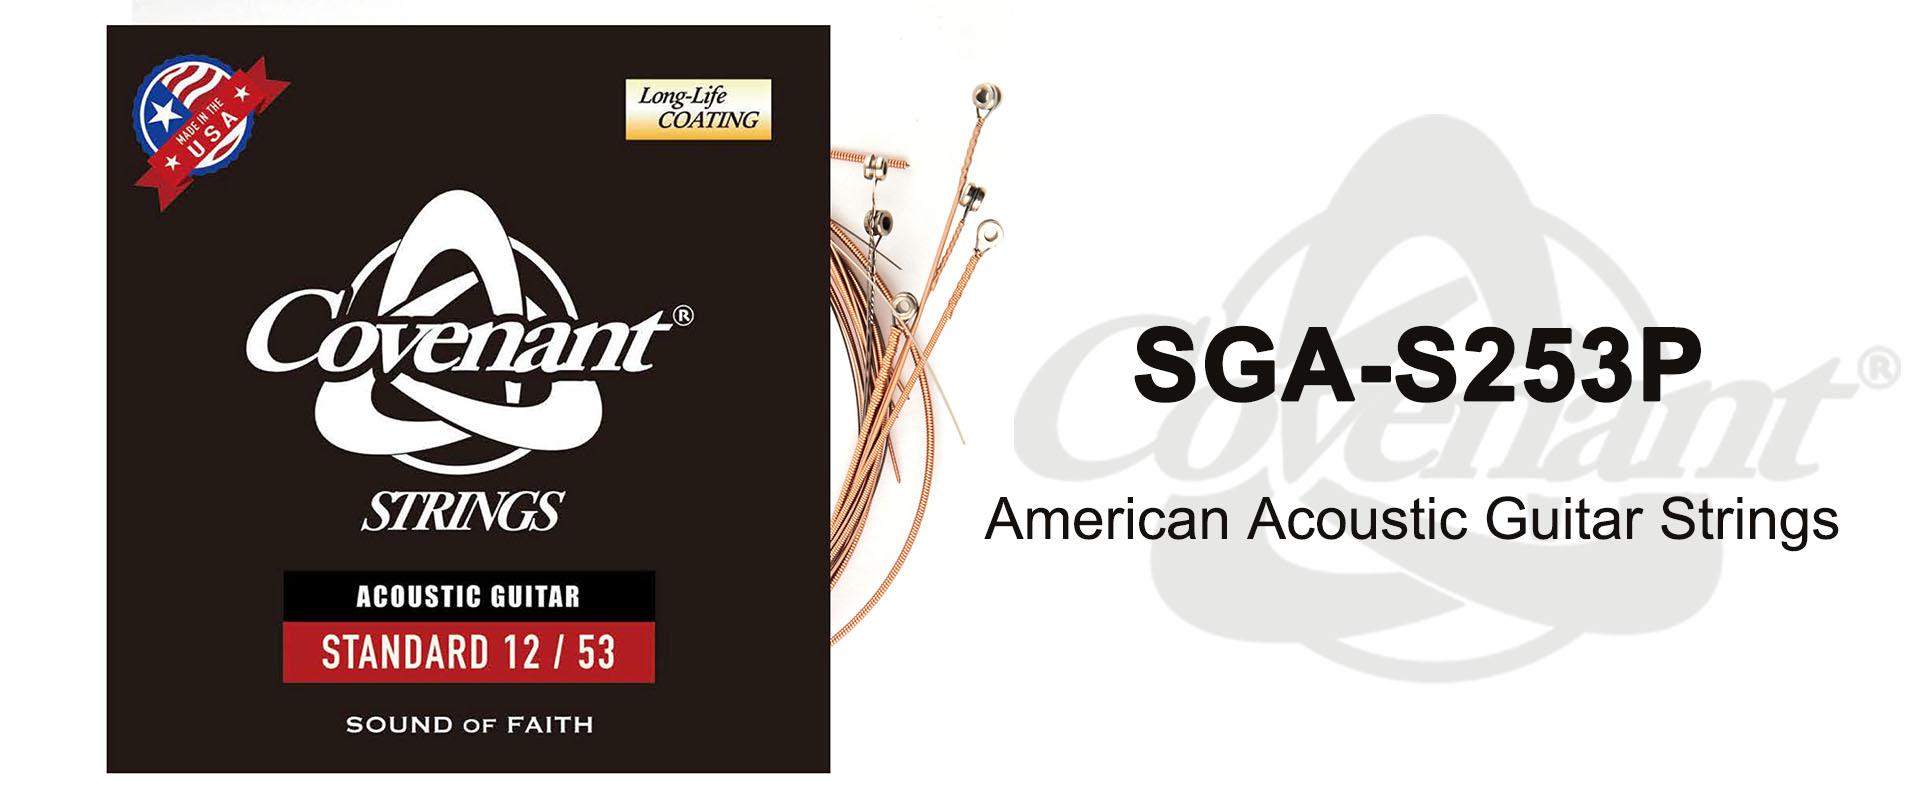 SGA-S253P